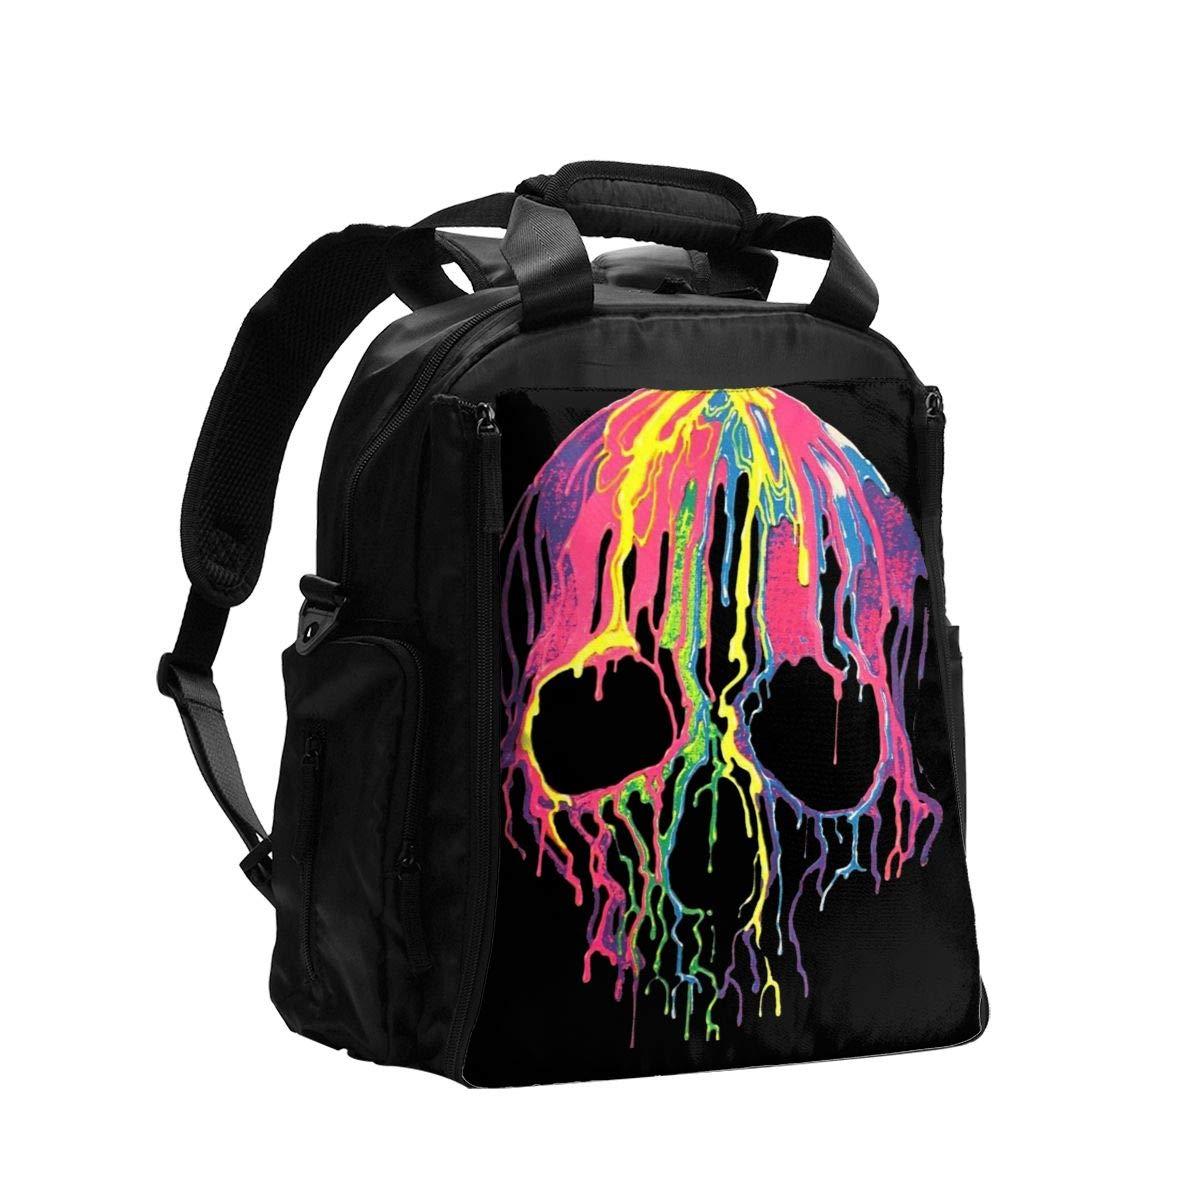 Melting Skull Diaper Bag Backpack Travel Backpack Maternity Baby Changing Bags